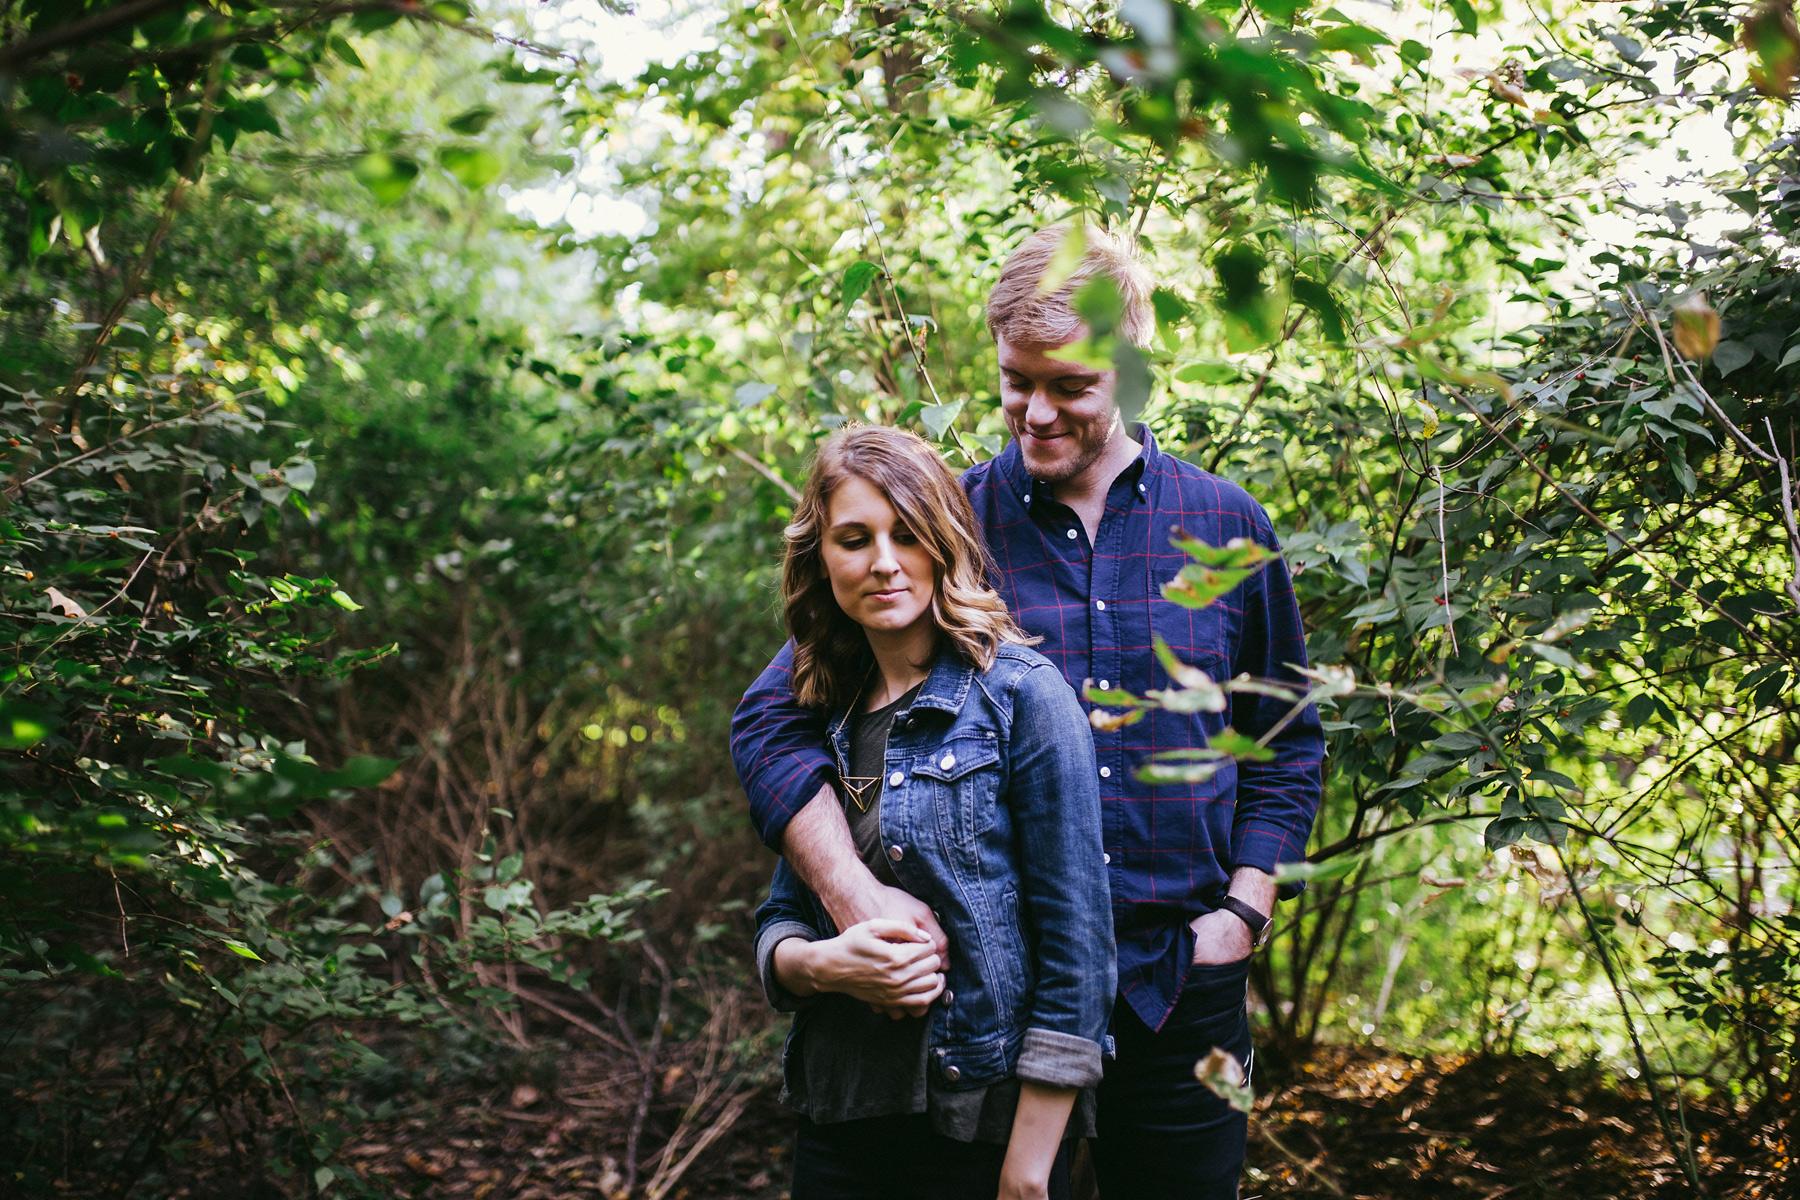 Capen Park Riverside Forest Engagement Photos_Kindling Wedding Photography Blog07.JPG